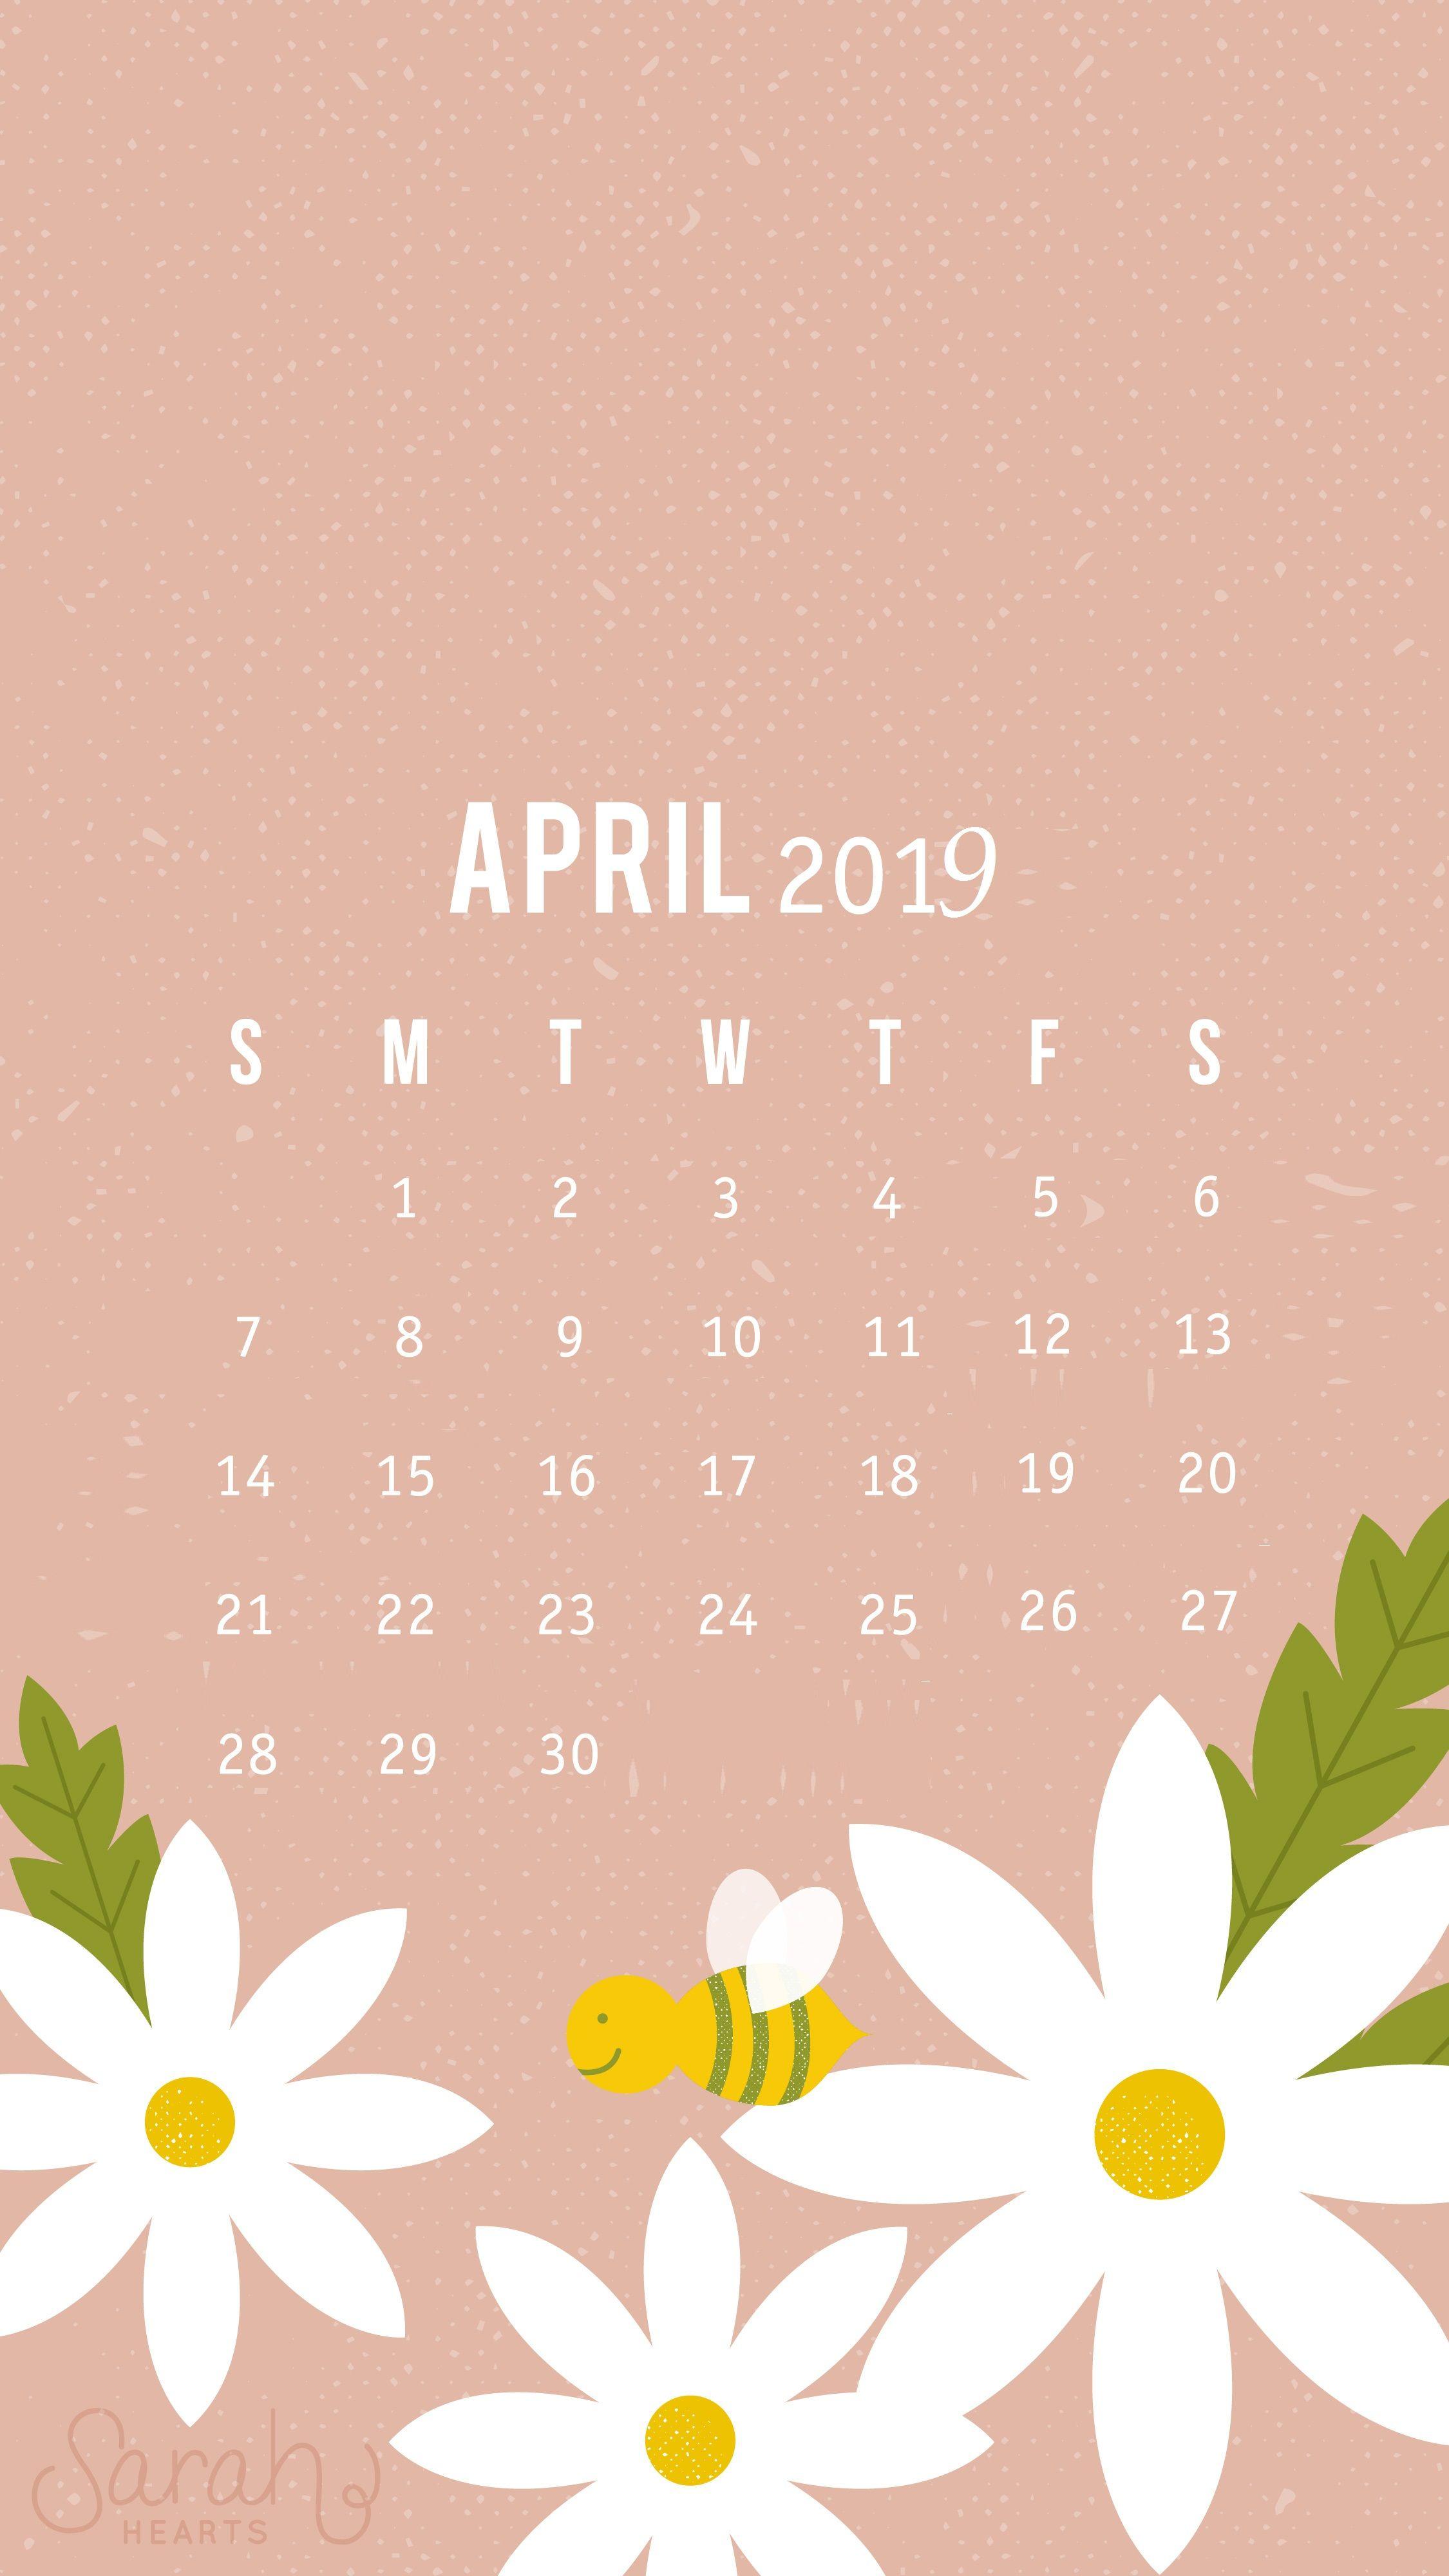 April 2019 Iphone Calendar Wallpaper Calendar Wallpaper